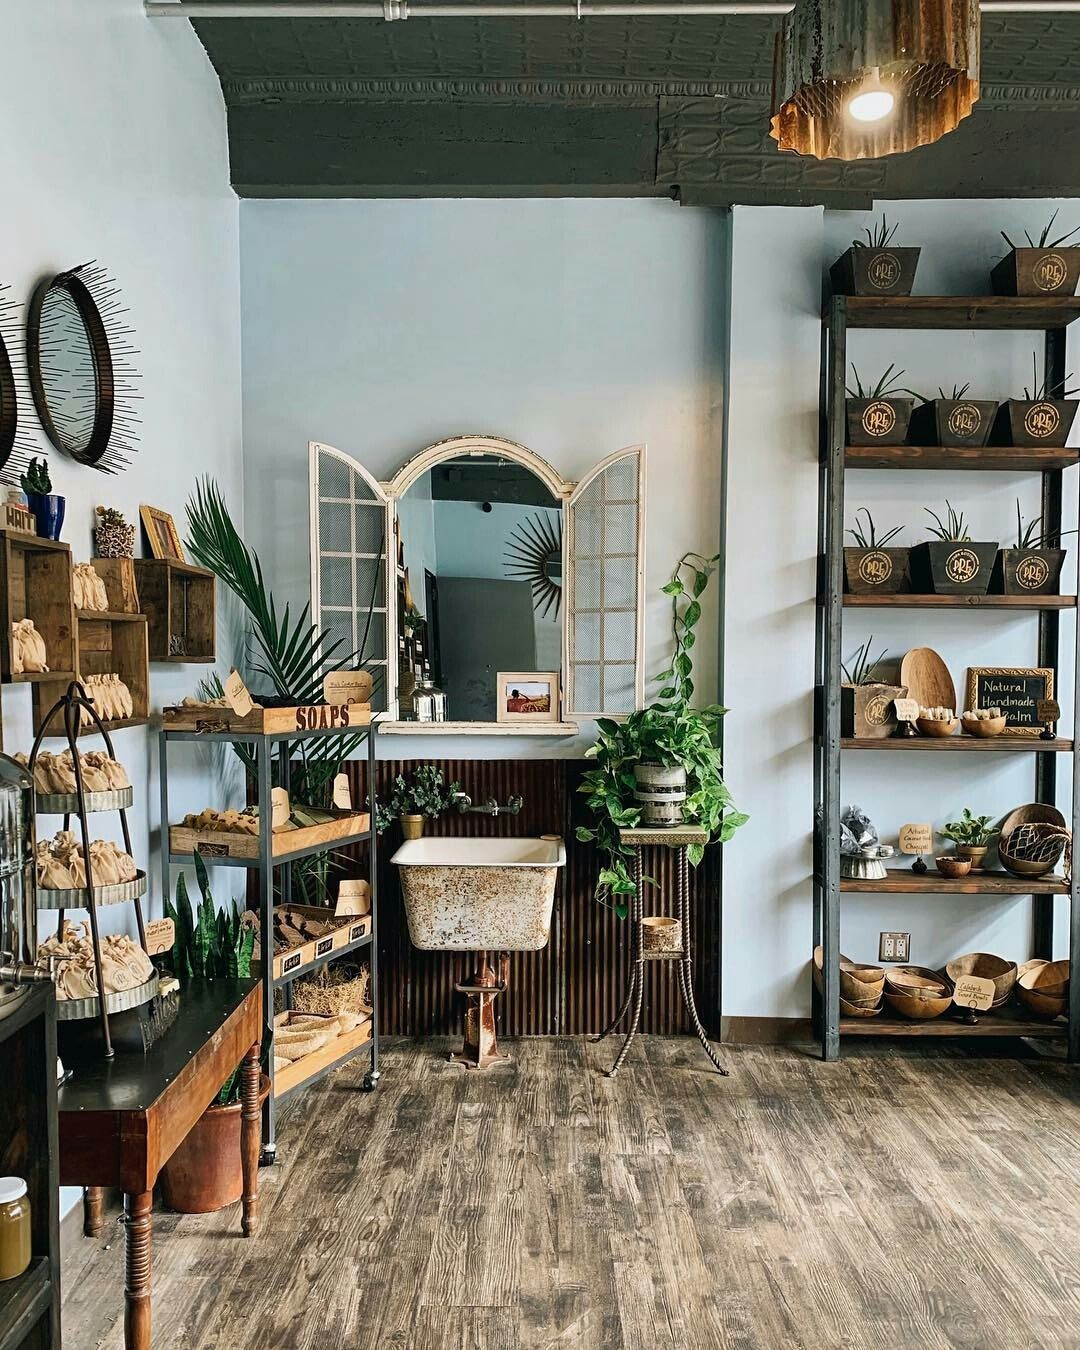 Pin by wood amaze on designs interior design home decor inspiration also rh pinterest